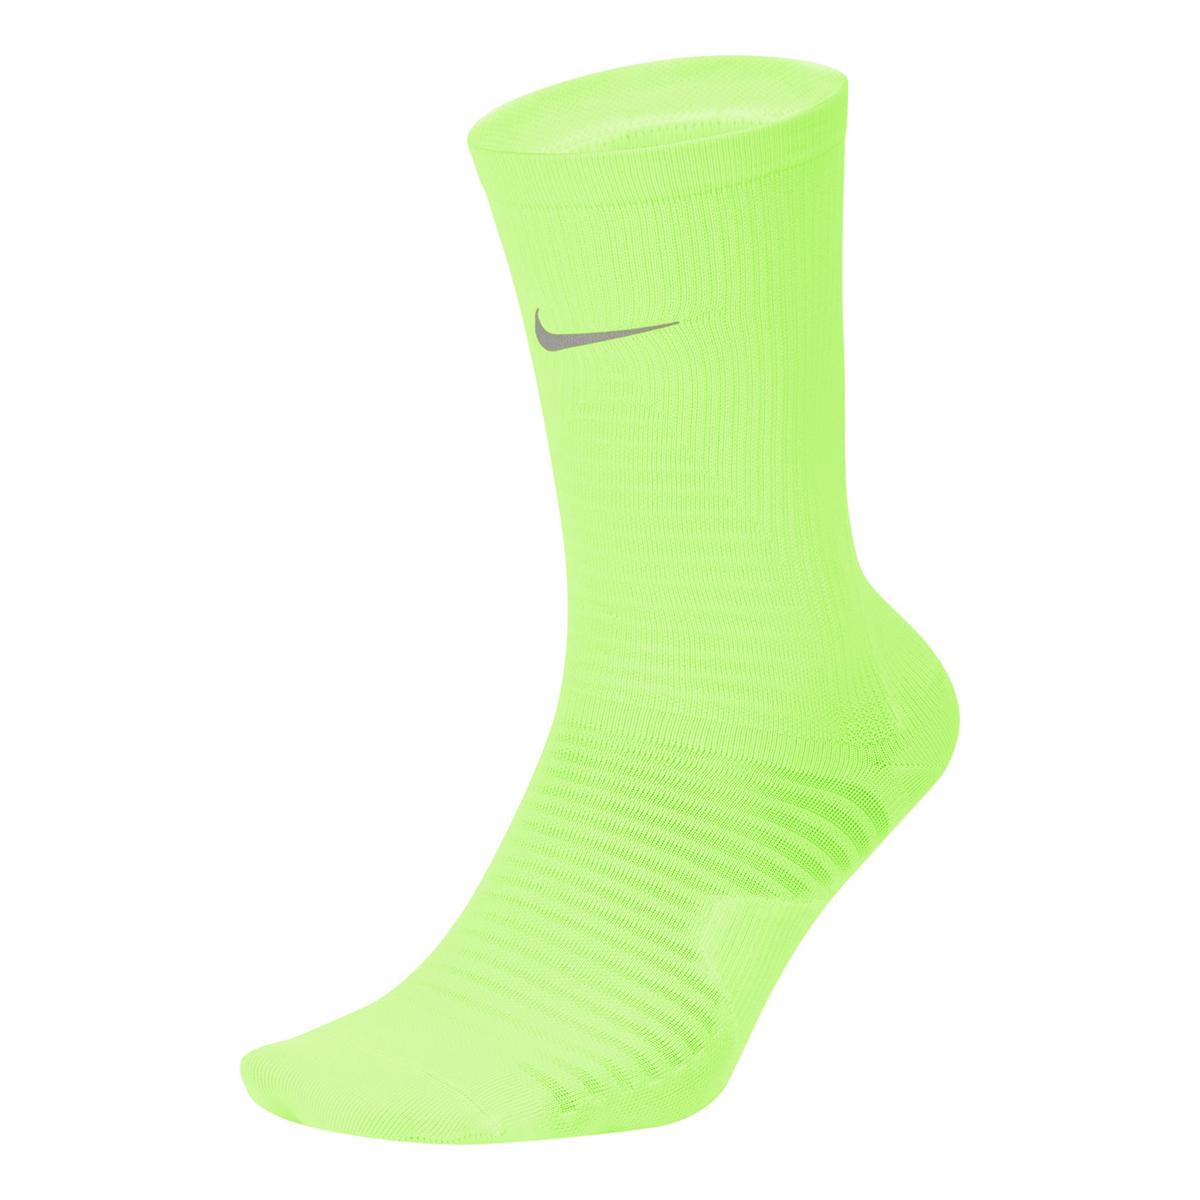 Nike Spark Lightweight Crew Running Socks, , large, image 1